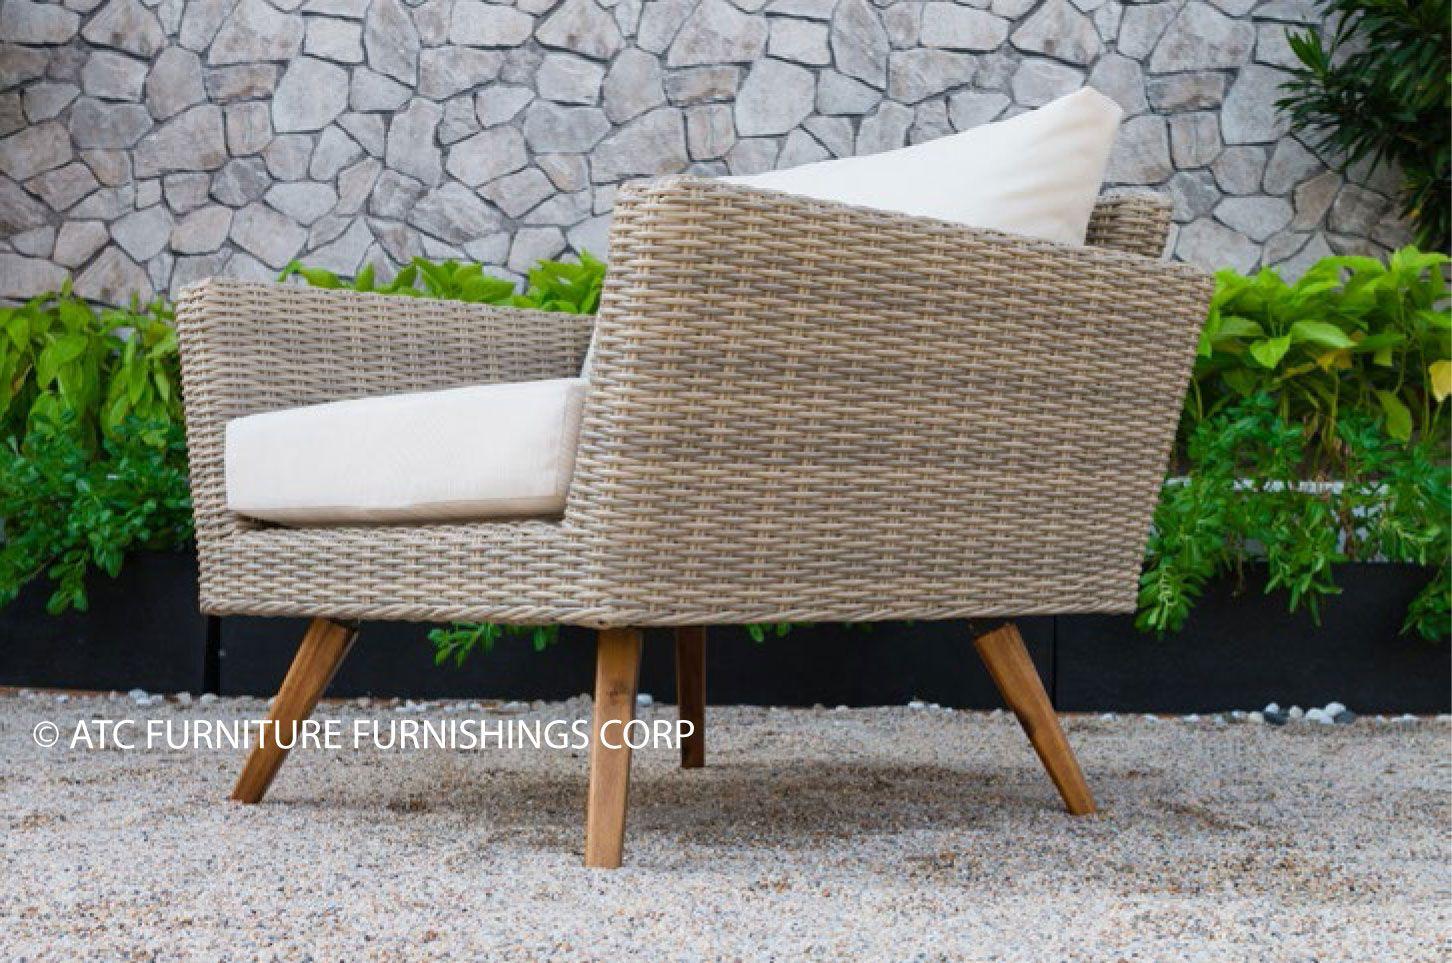 Canary Collection From Atc Garden Rattan Furniture Manufacturer  # Muebles De Jardin Wicker